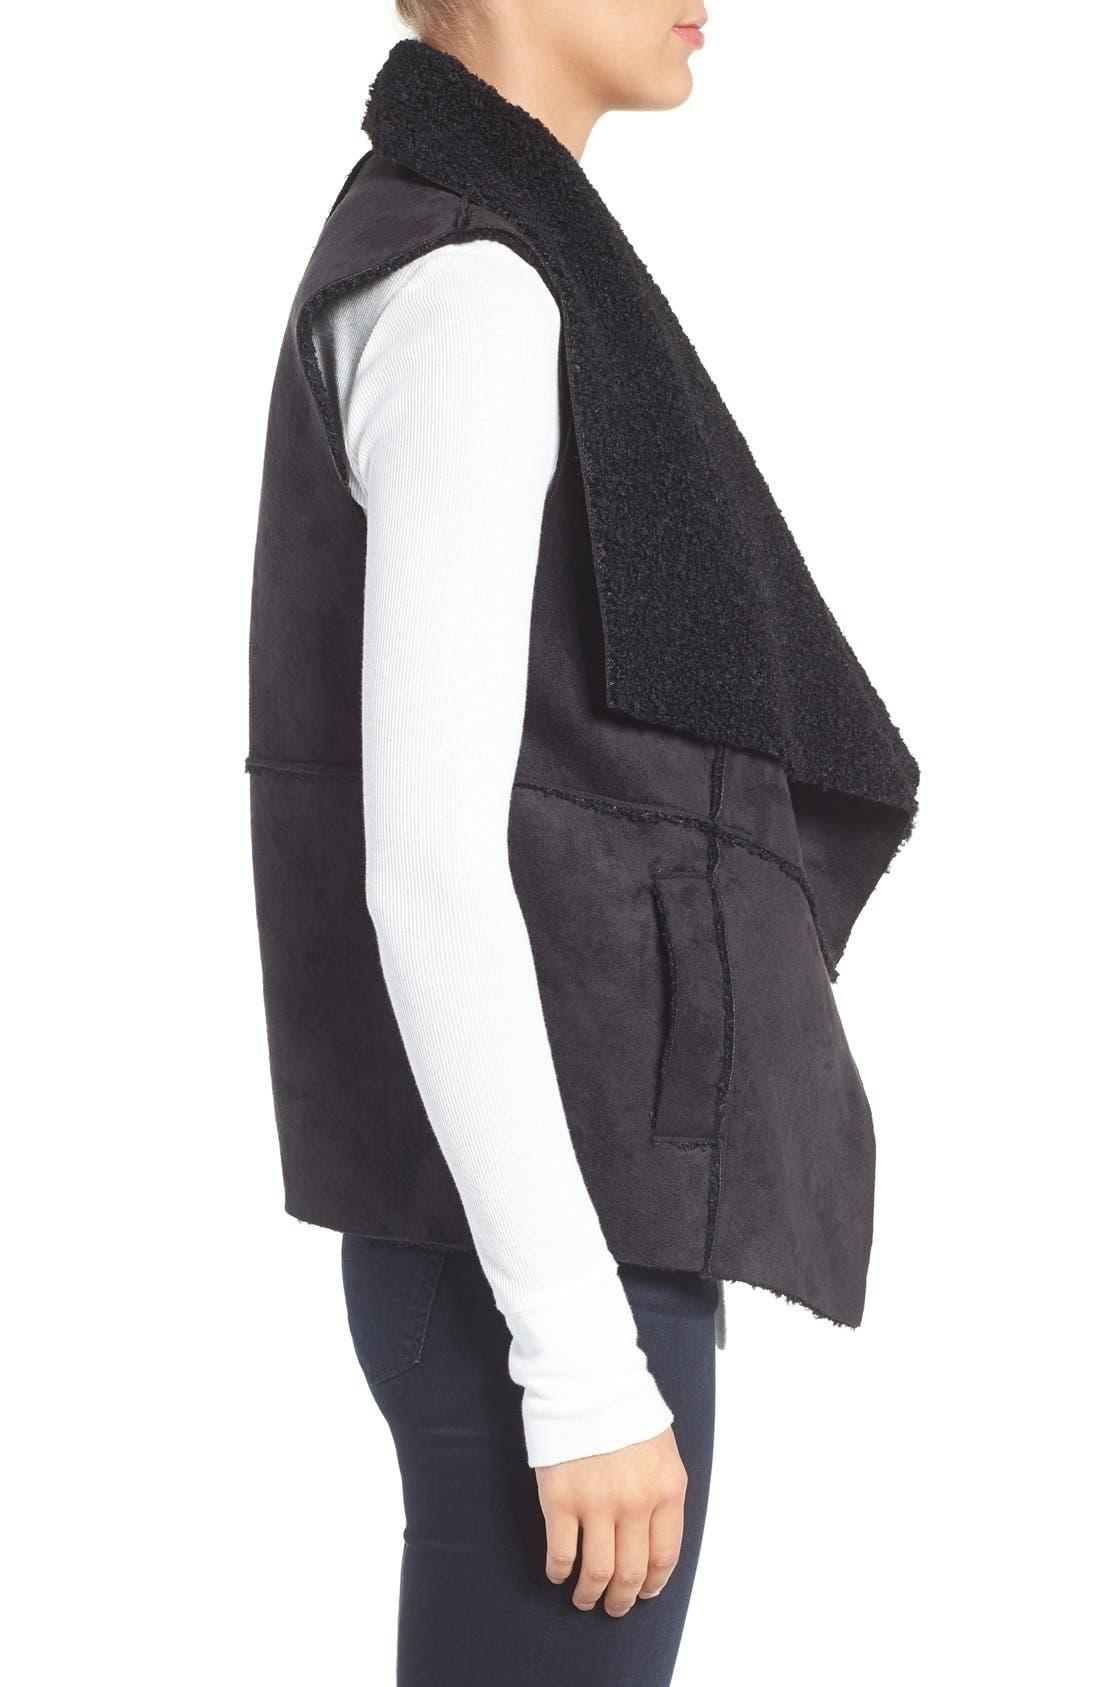 Goslett Faux Shearling Vest,                             Alternate thumbnail 3, color,                             001